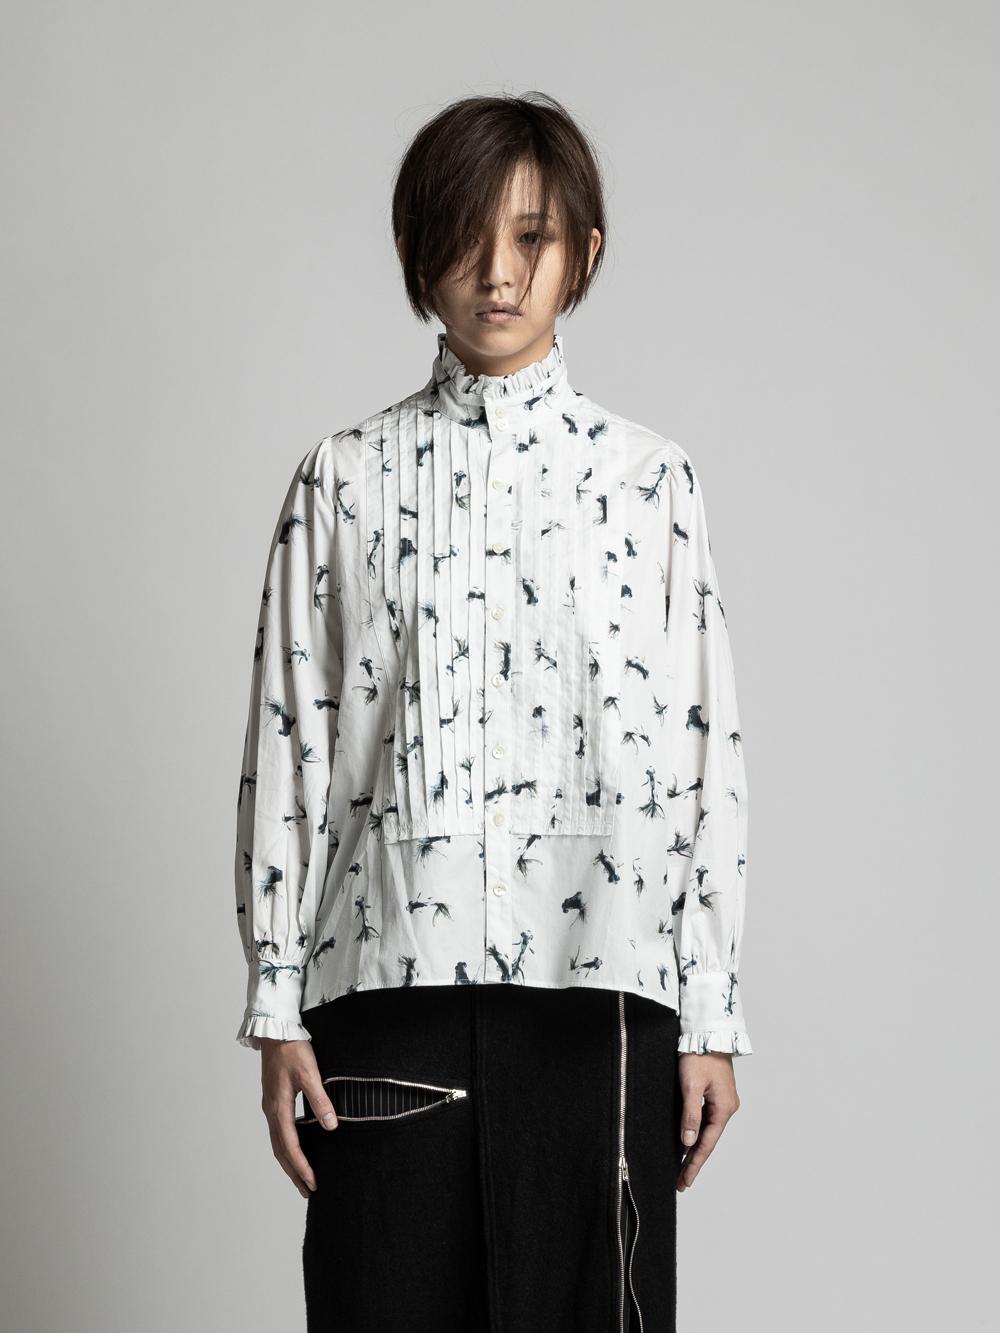 VI-PM-023-02 / PATRICIA MARCH コラボレーション 金魚プリント ピンタック長袖シャツ